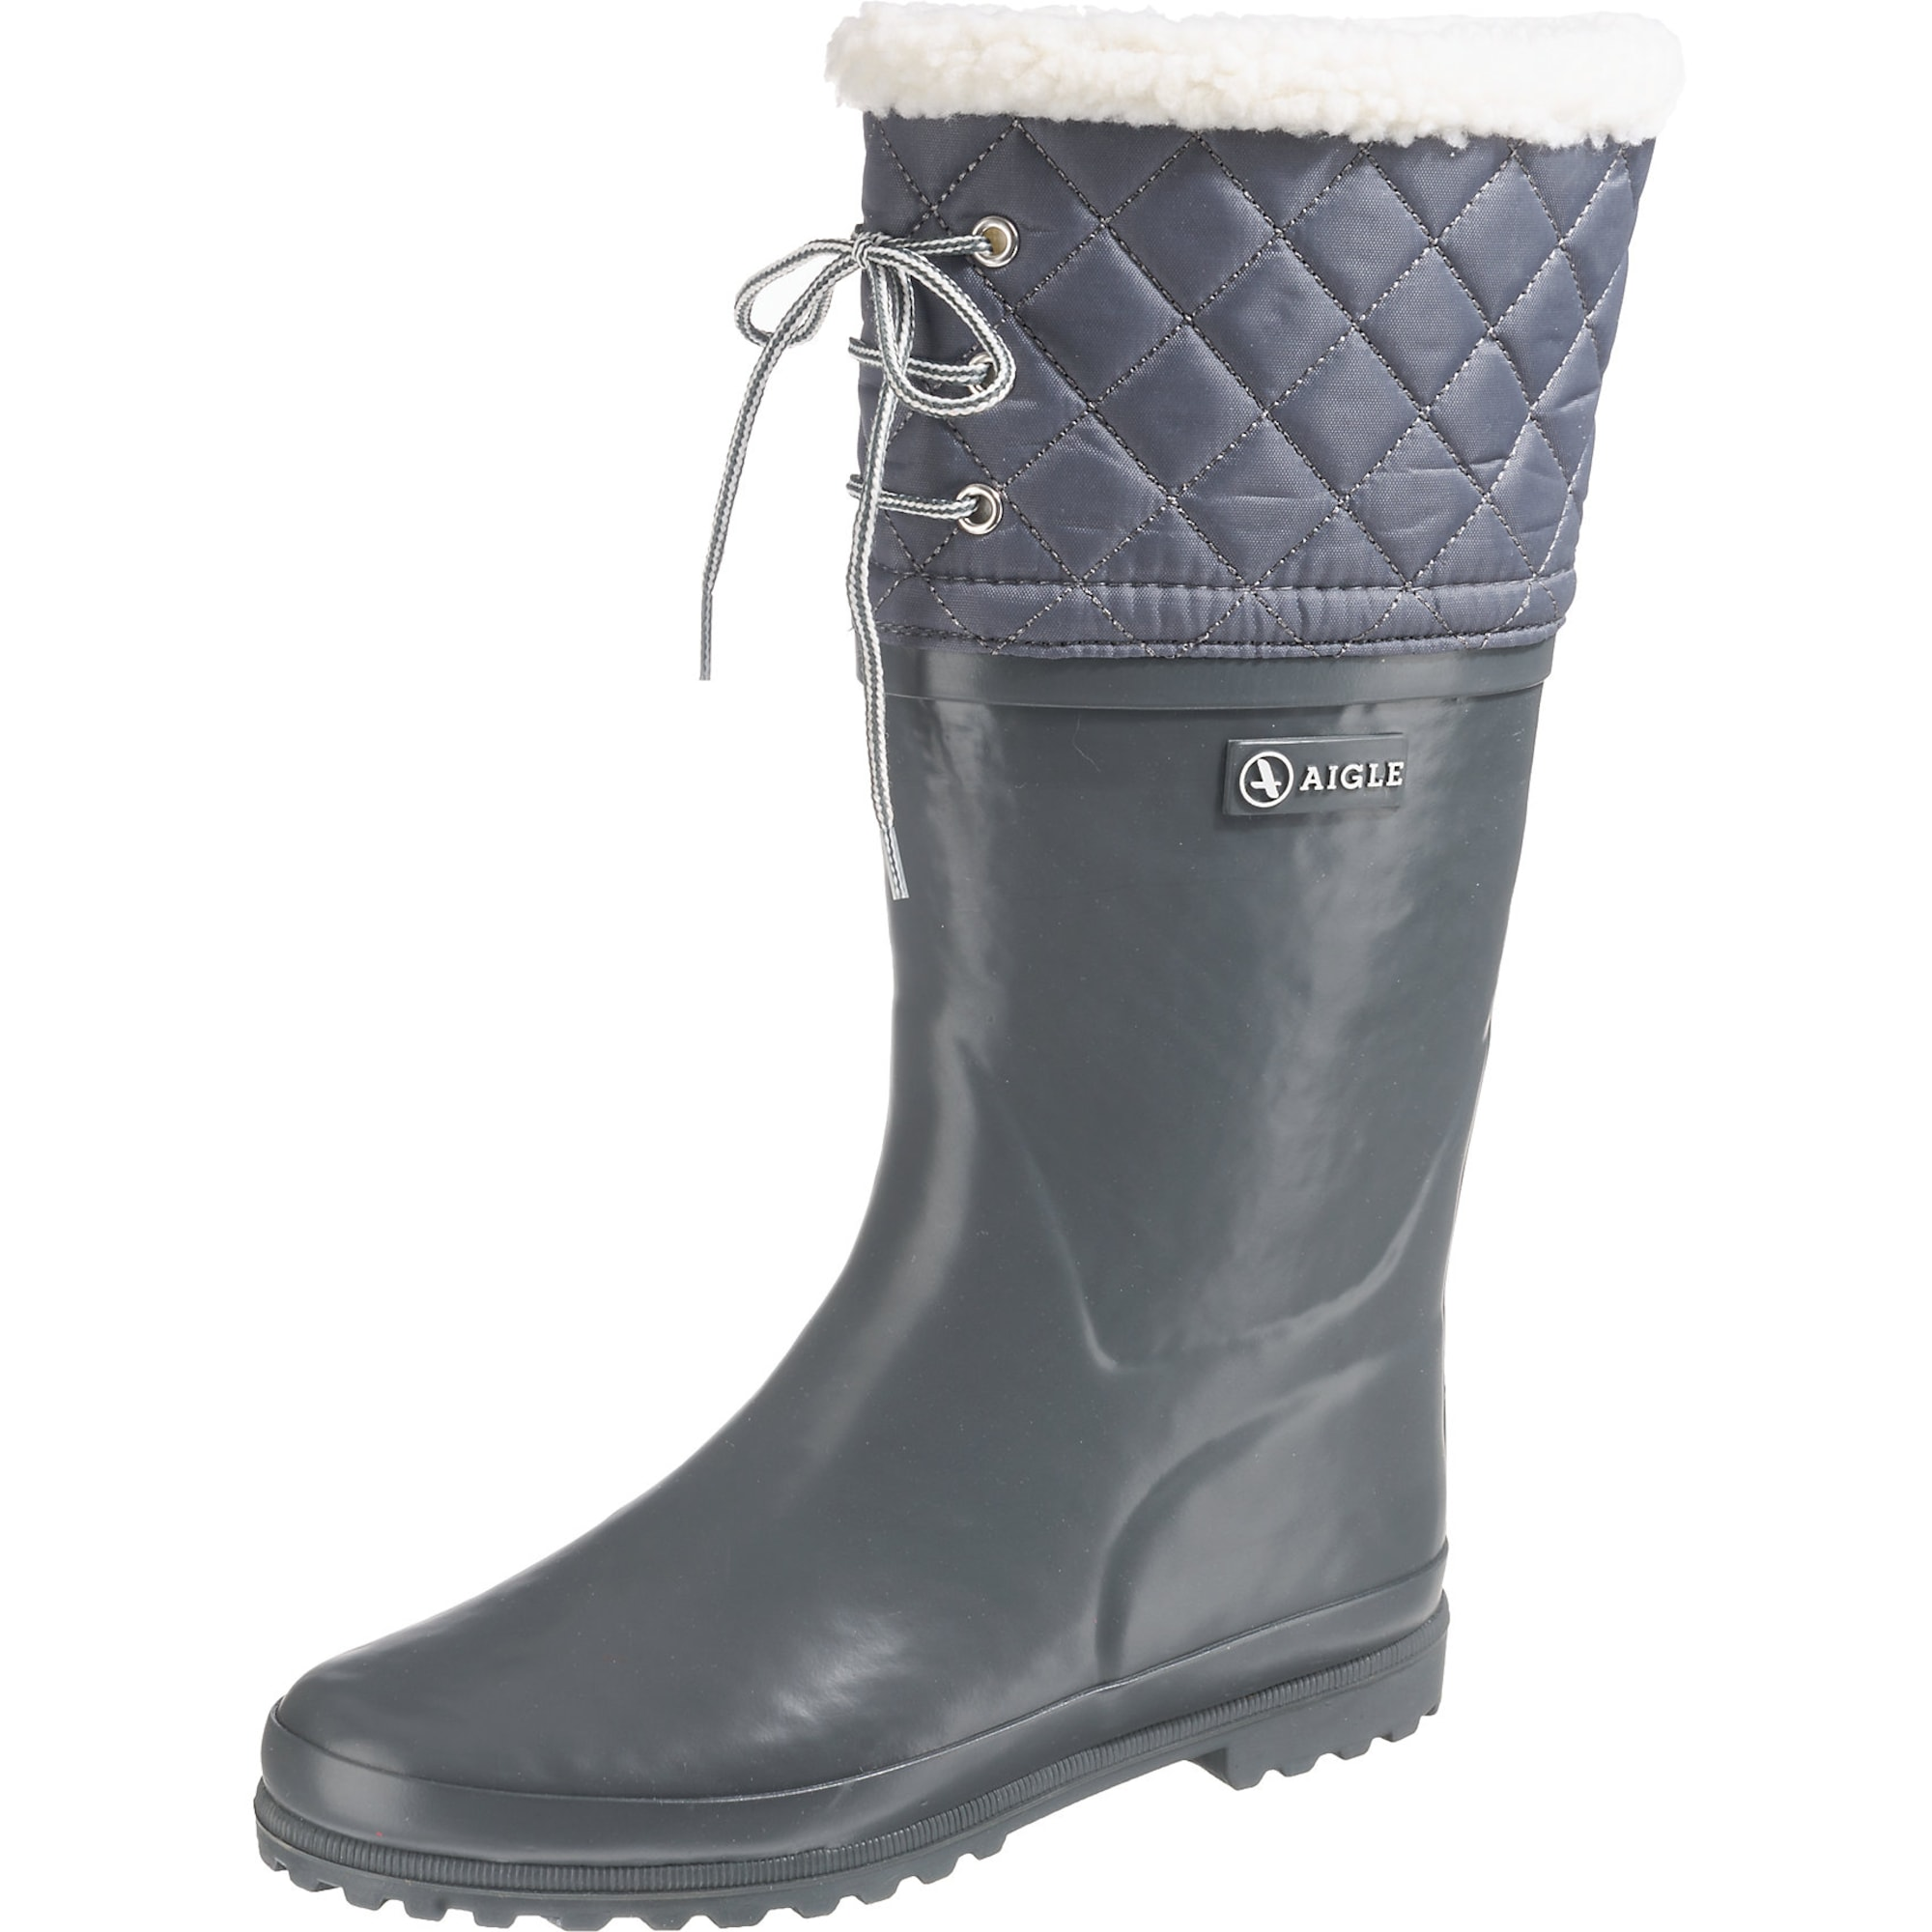 Gummistiefel 'POLKA GIBOULÉE'   Schuhe > Gummistiefel   Grau   Aigle